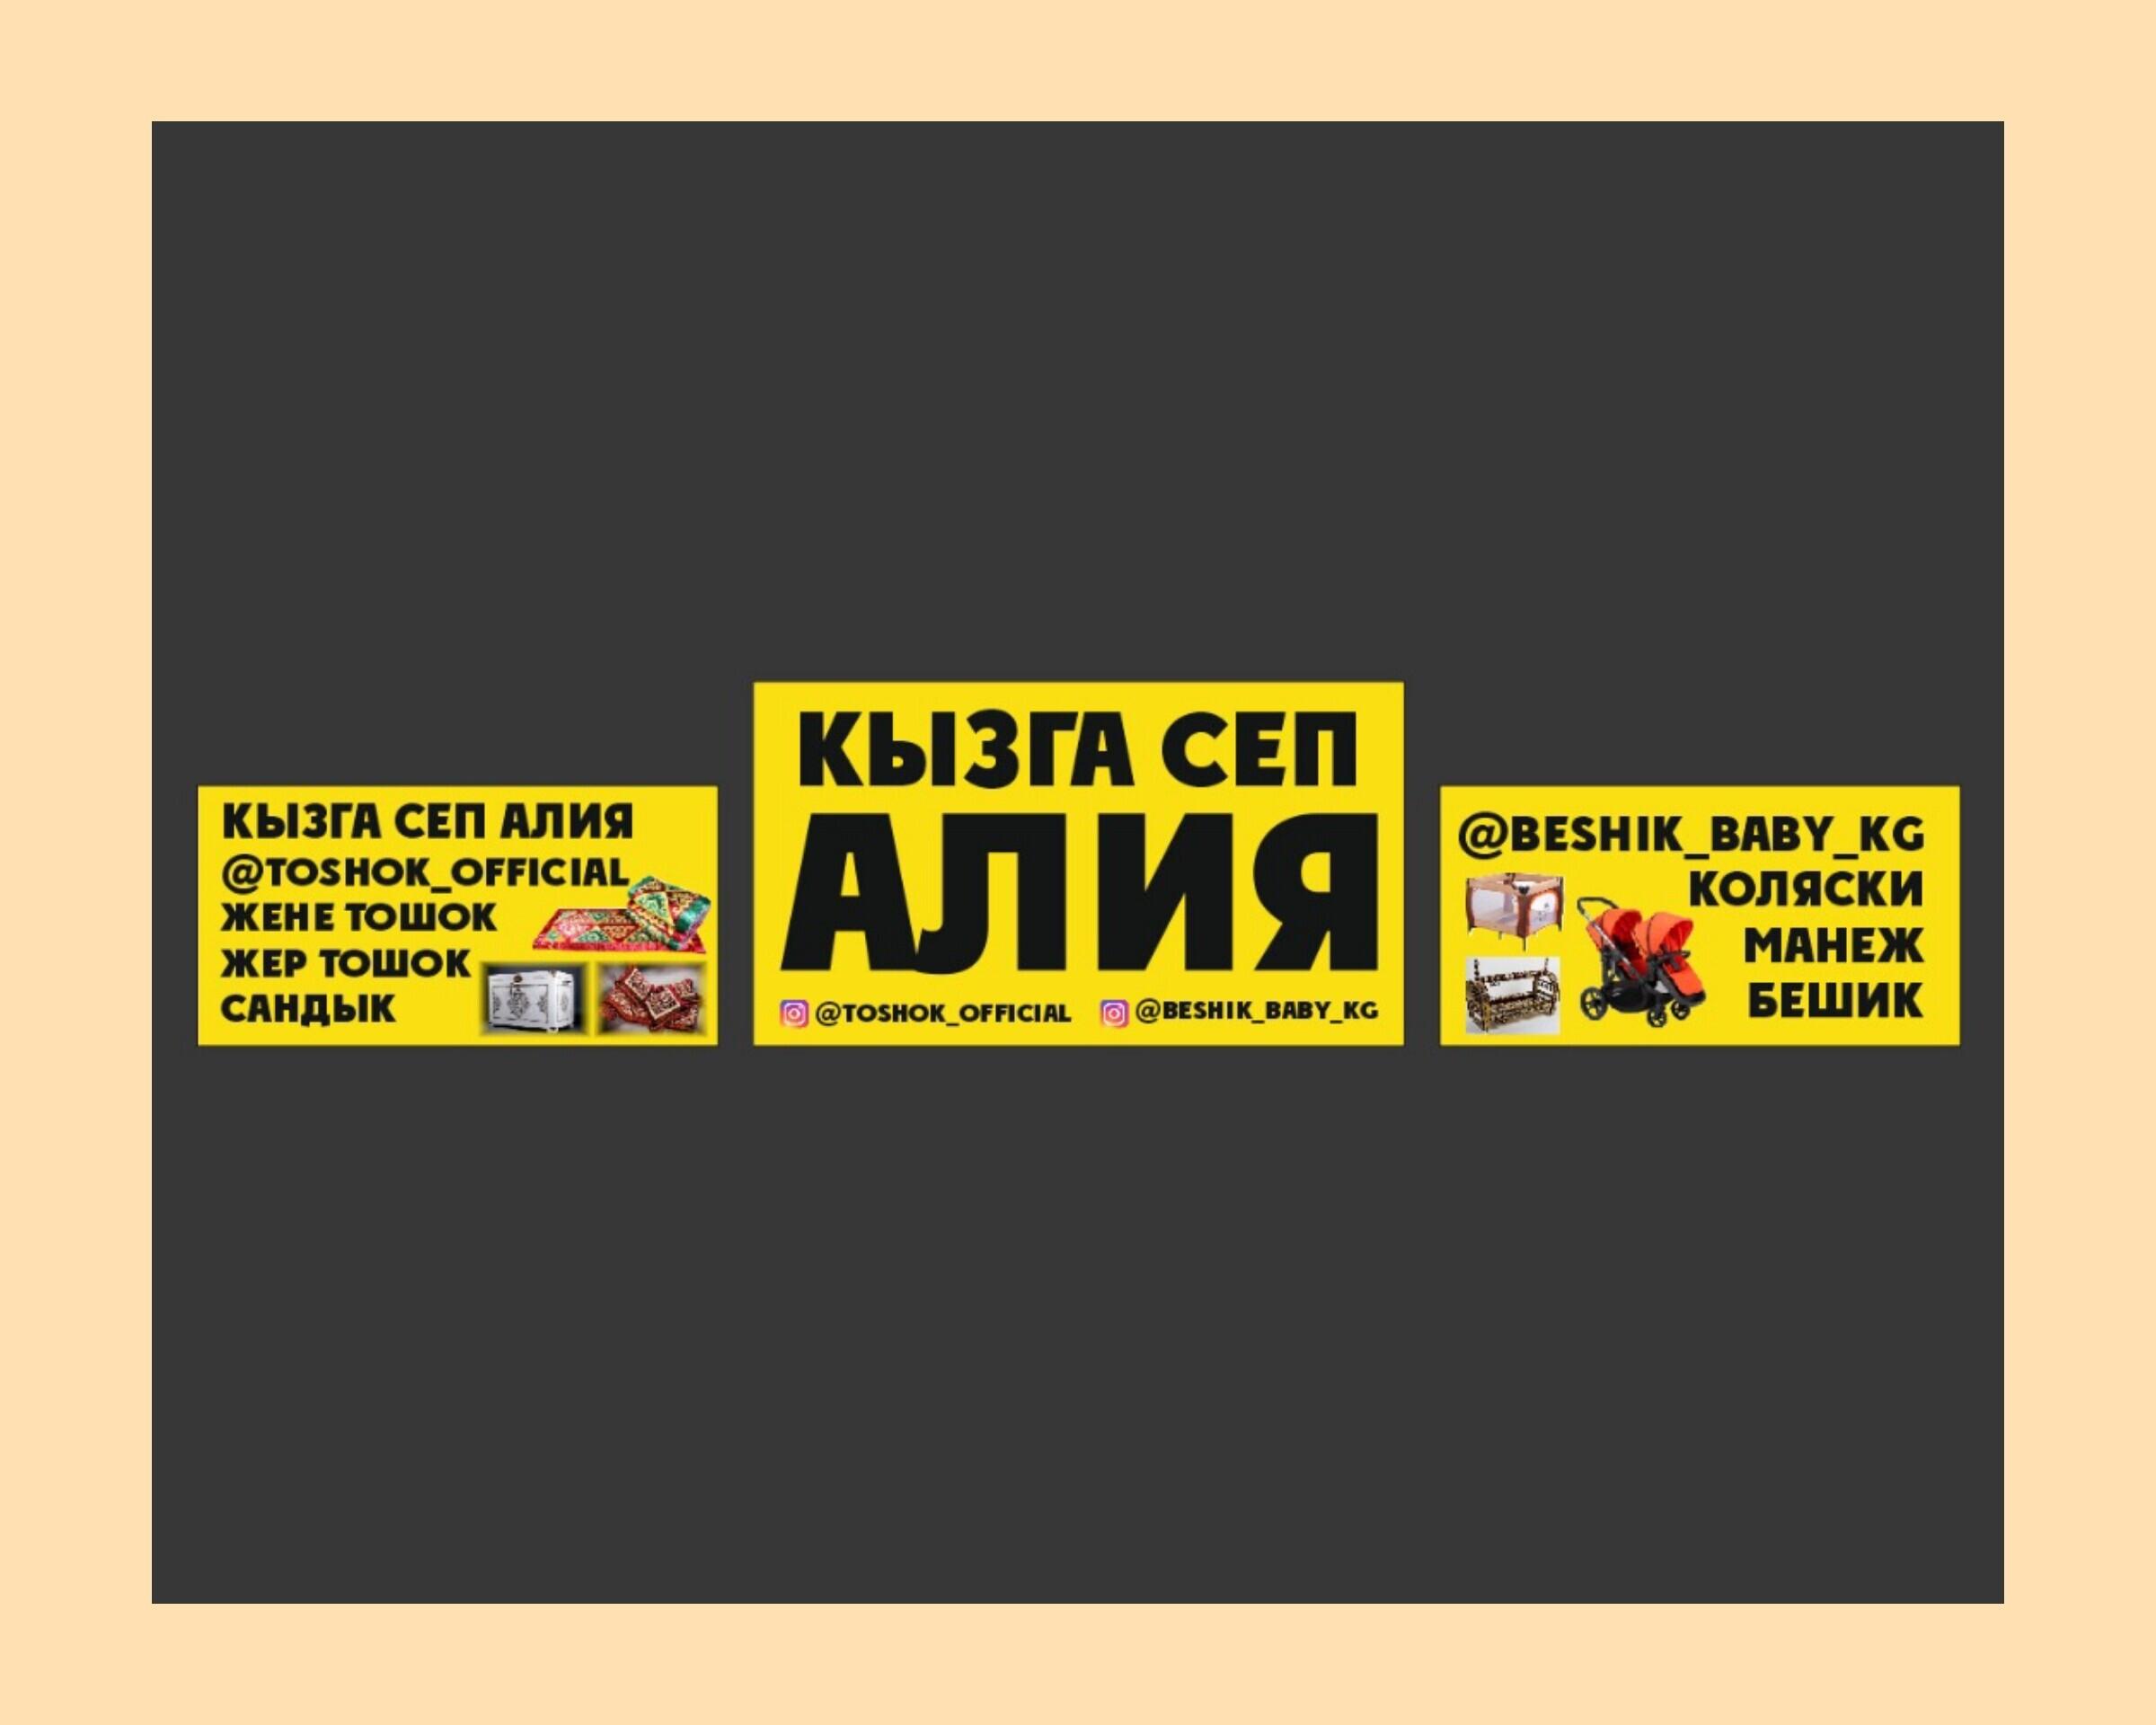 КЫЗГА СЕП ~ АЛИЯ~ - Бизнес-профиль компании на lalafo.kg   Кыргызстан